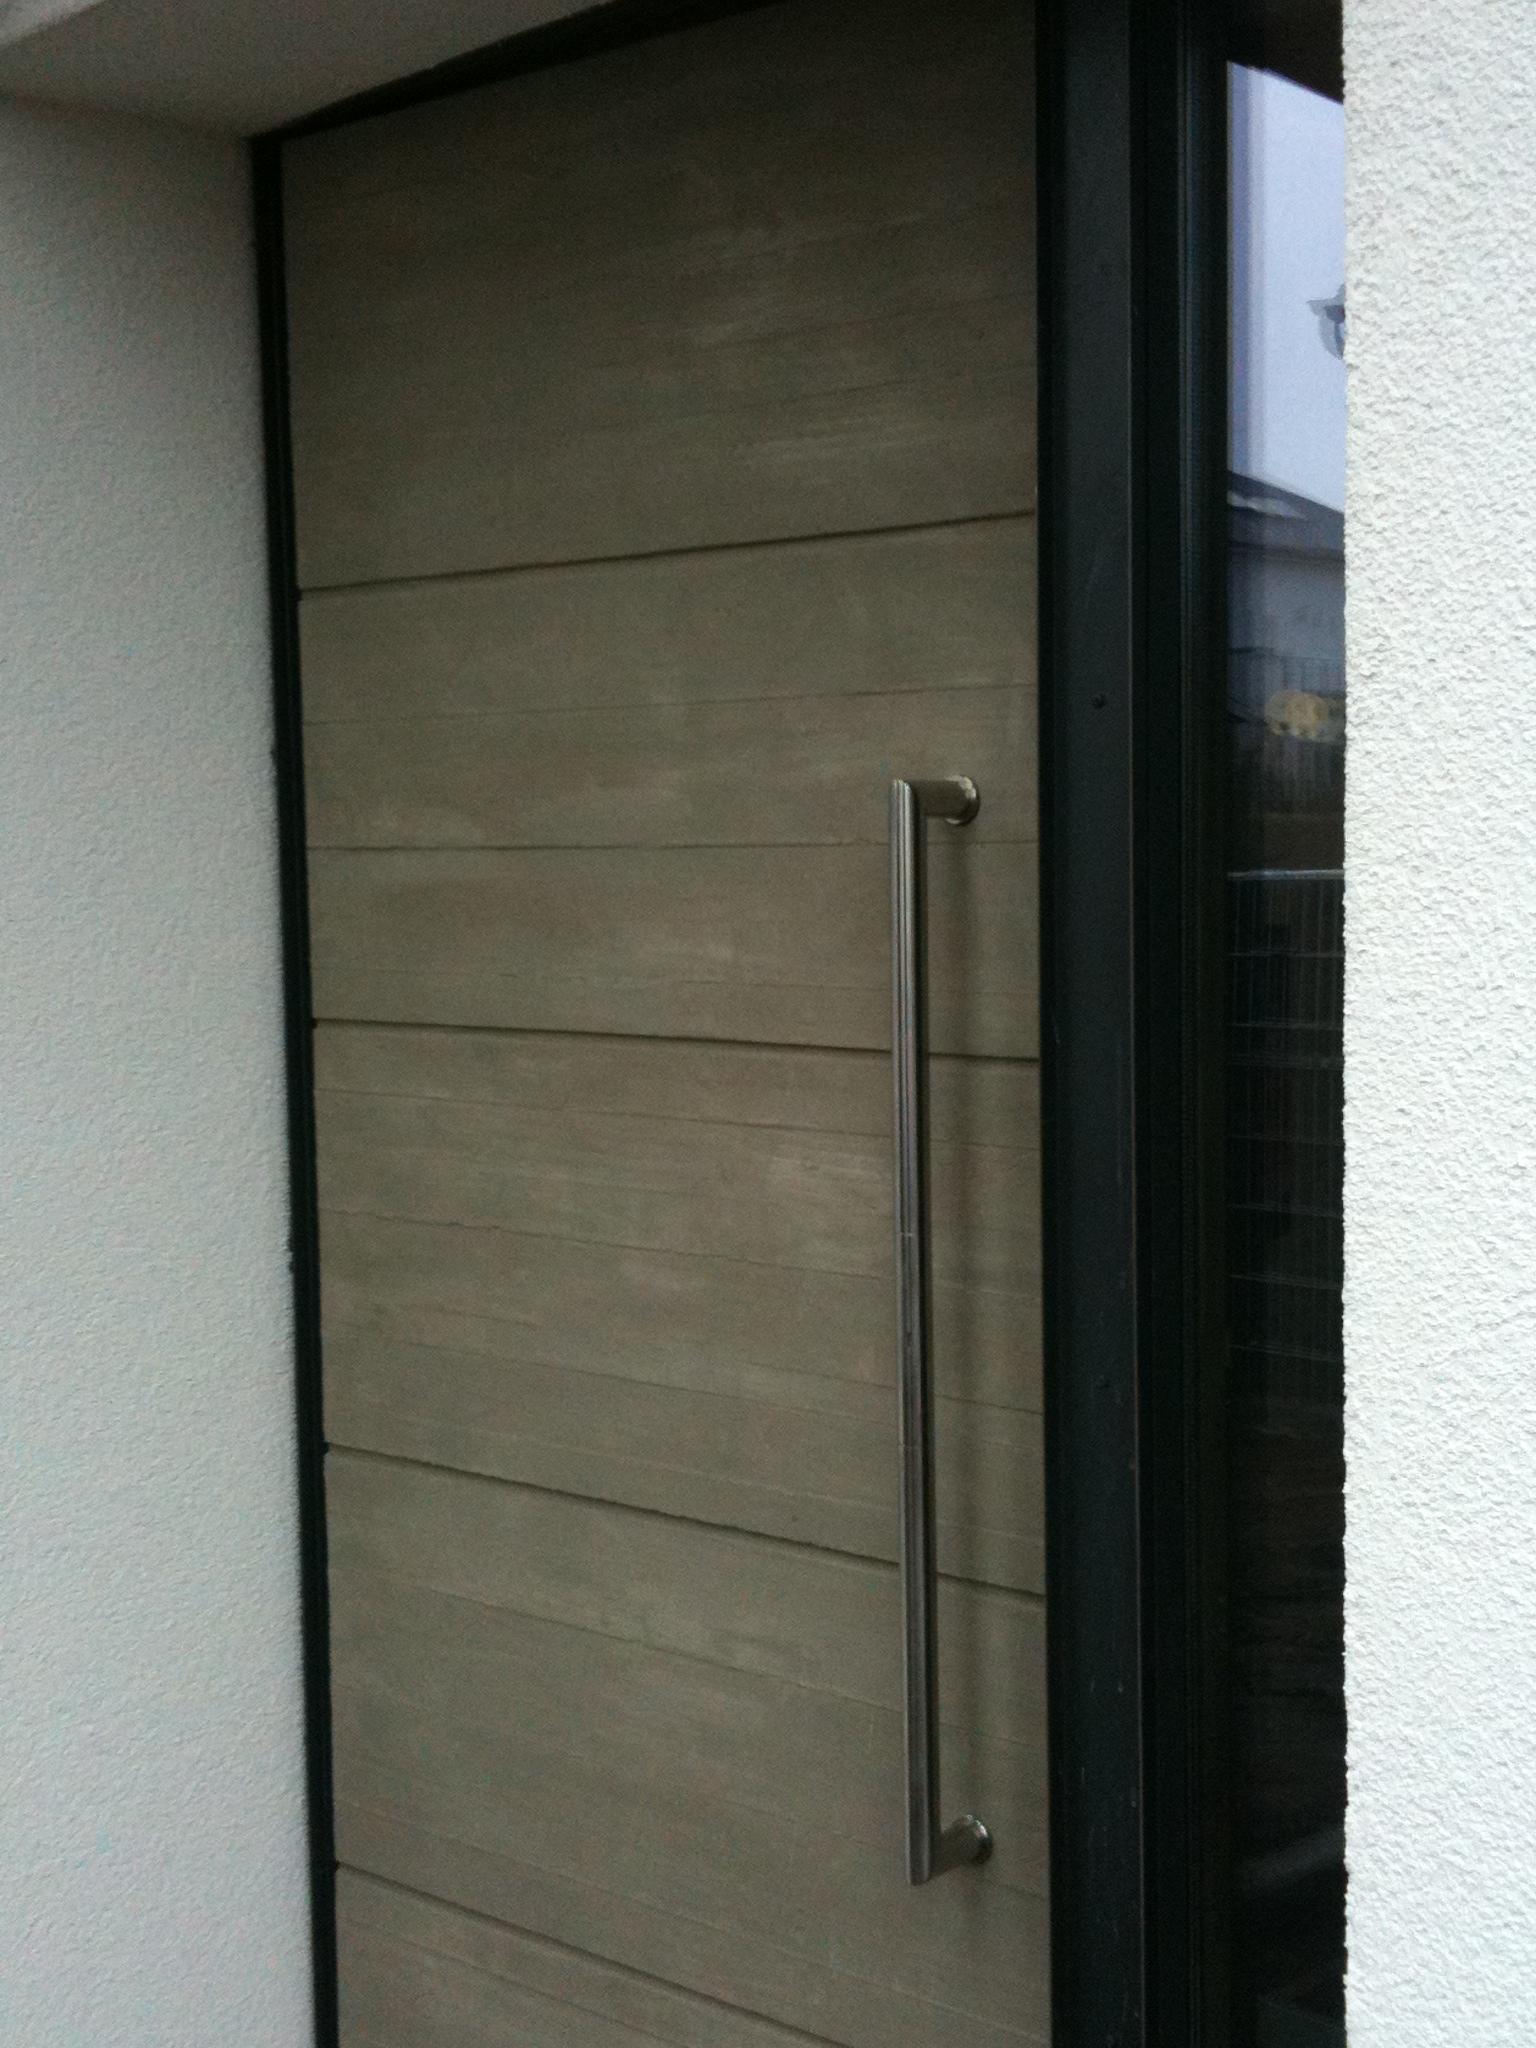 haust r mit betonf llung preis auf anfrage metall kreativ ug shop. Black Bedroom Furniture Sets. Home Design Ideas